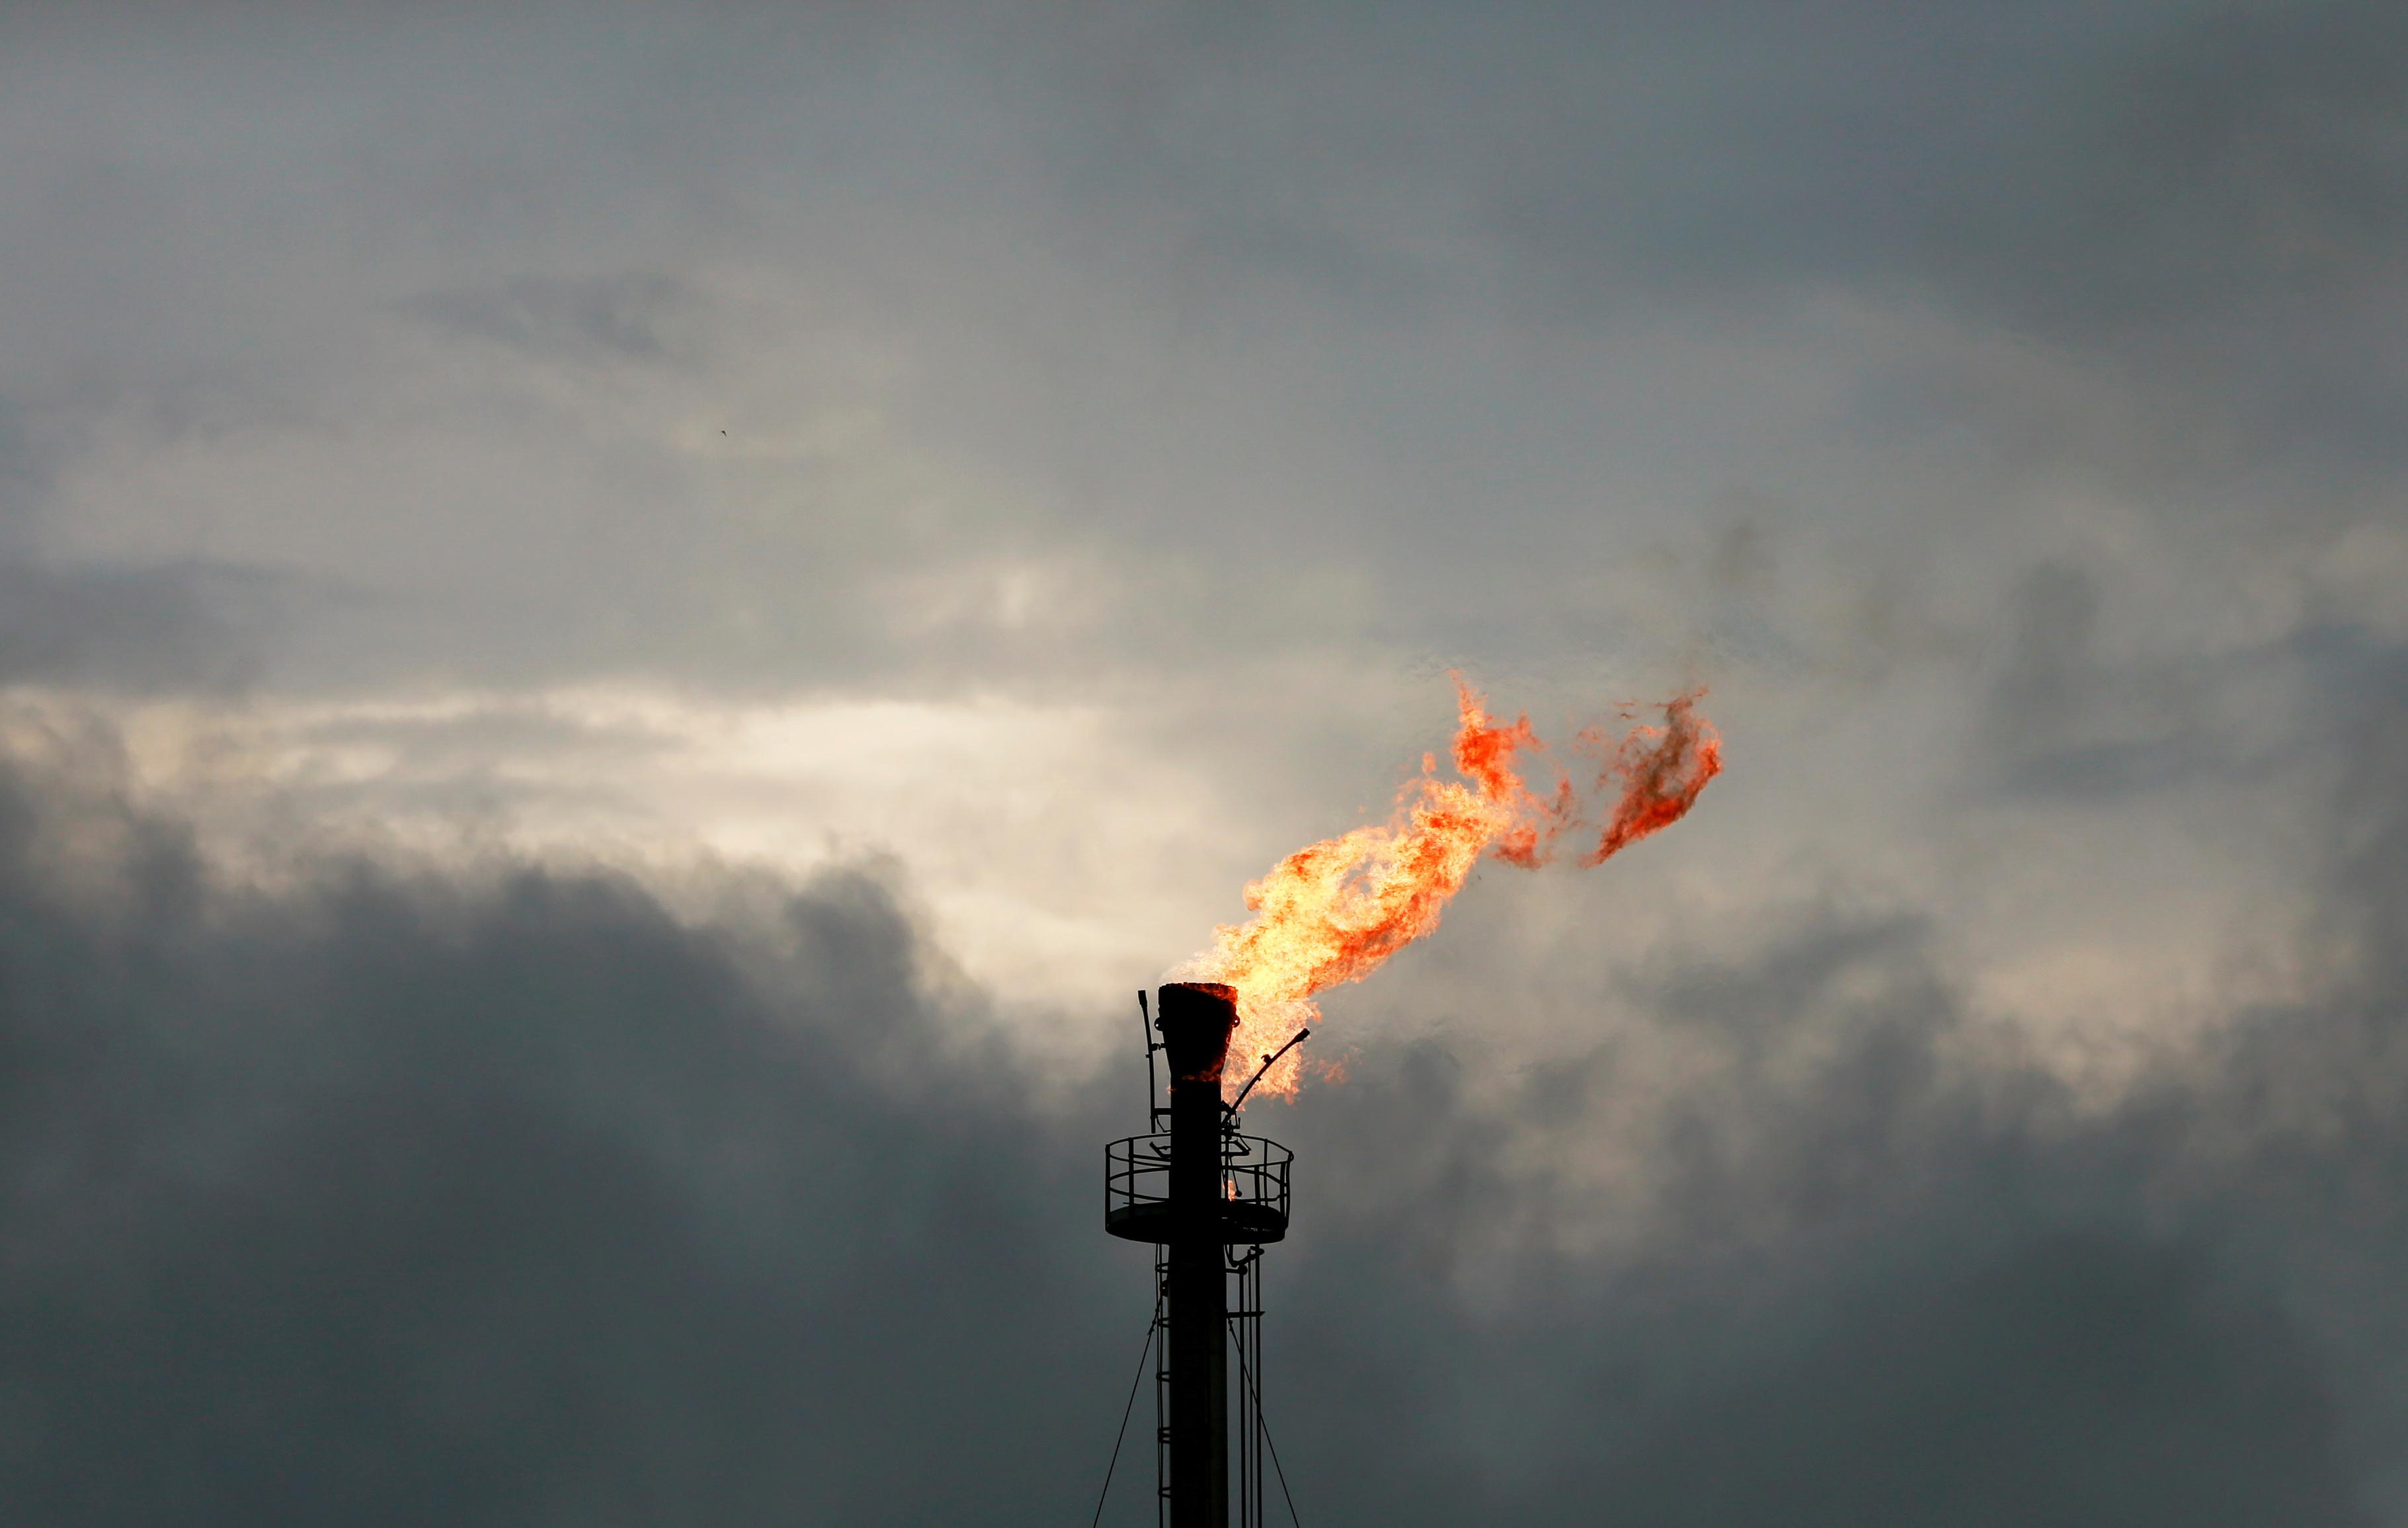 A vertical gas flaring furnace is seen in Ughelli, Delta State, Nigeria September 16, 2020. Picture taken September 16, 2020. REUTERS/Afolabi Sotunde